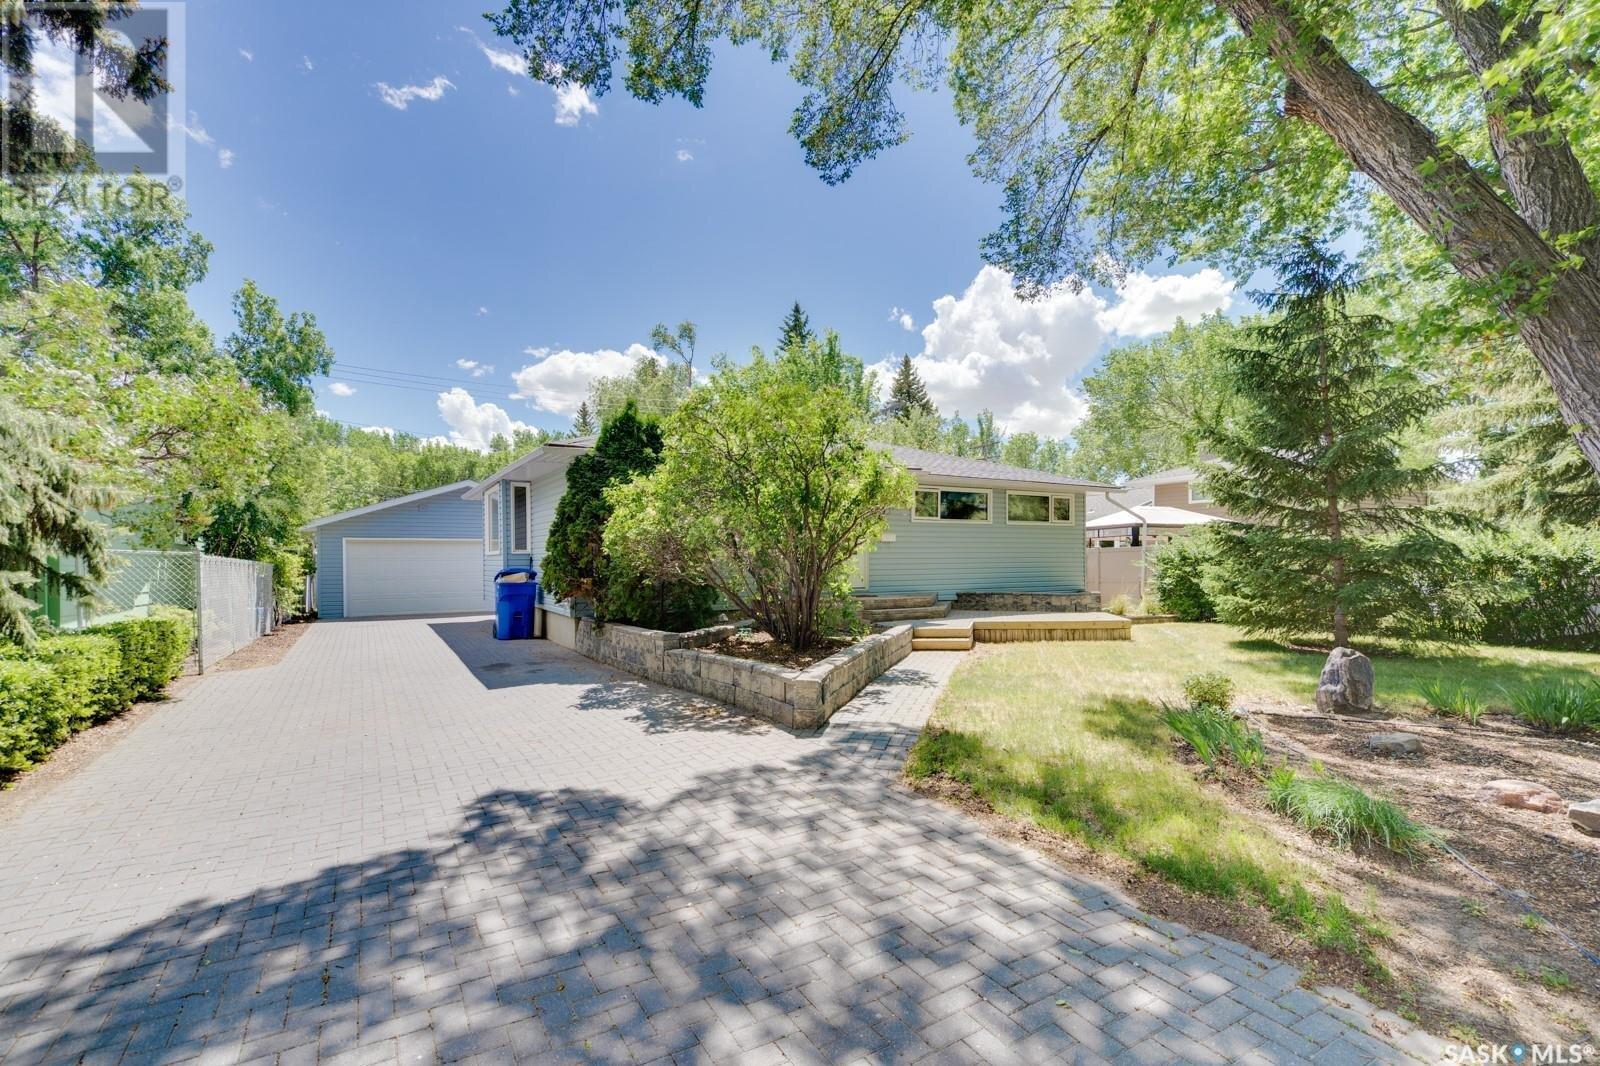 House for sale at 61 Anderson Ave Regina Saskatchewan - MLS: SK827587